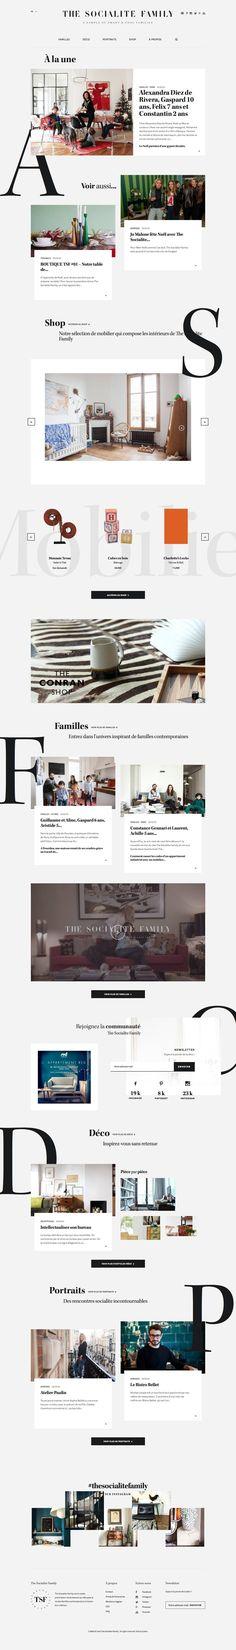 http://www.thesocialitefamily.com/